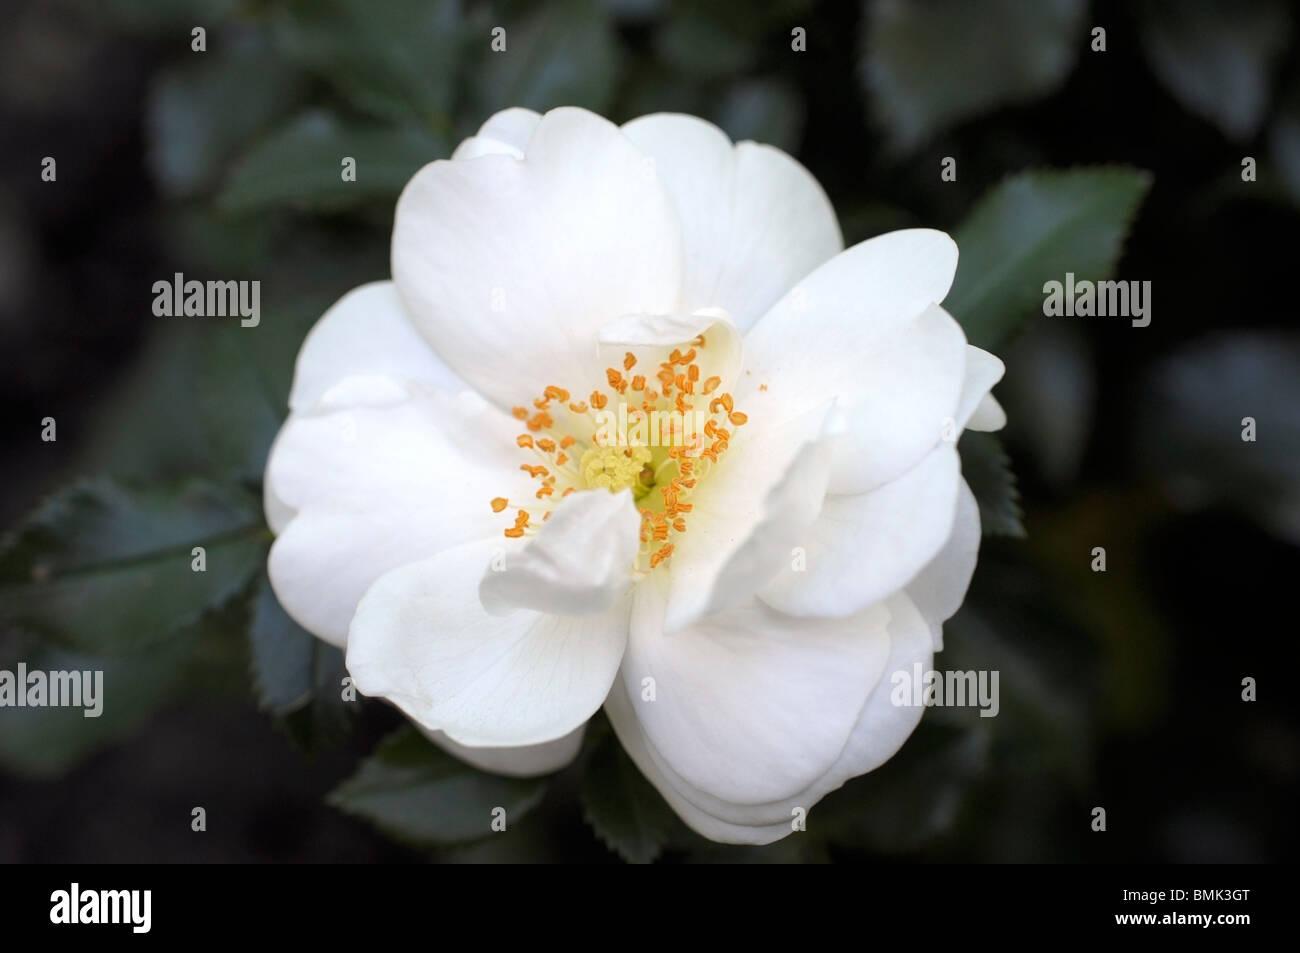 Bianco Rosa Vigorosa Immagini Stock